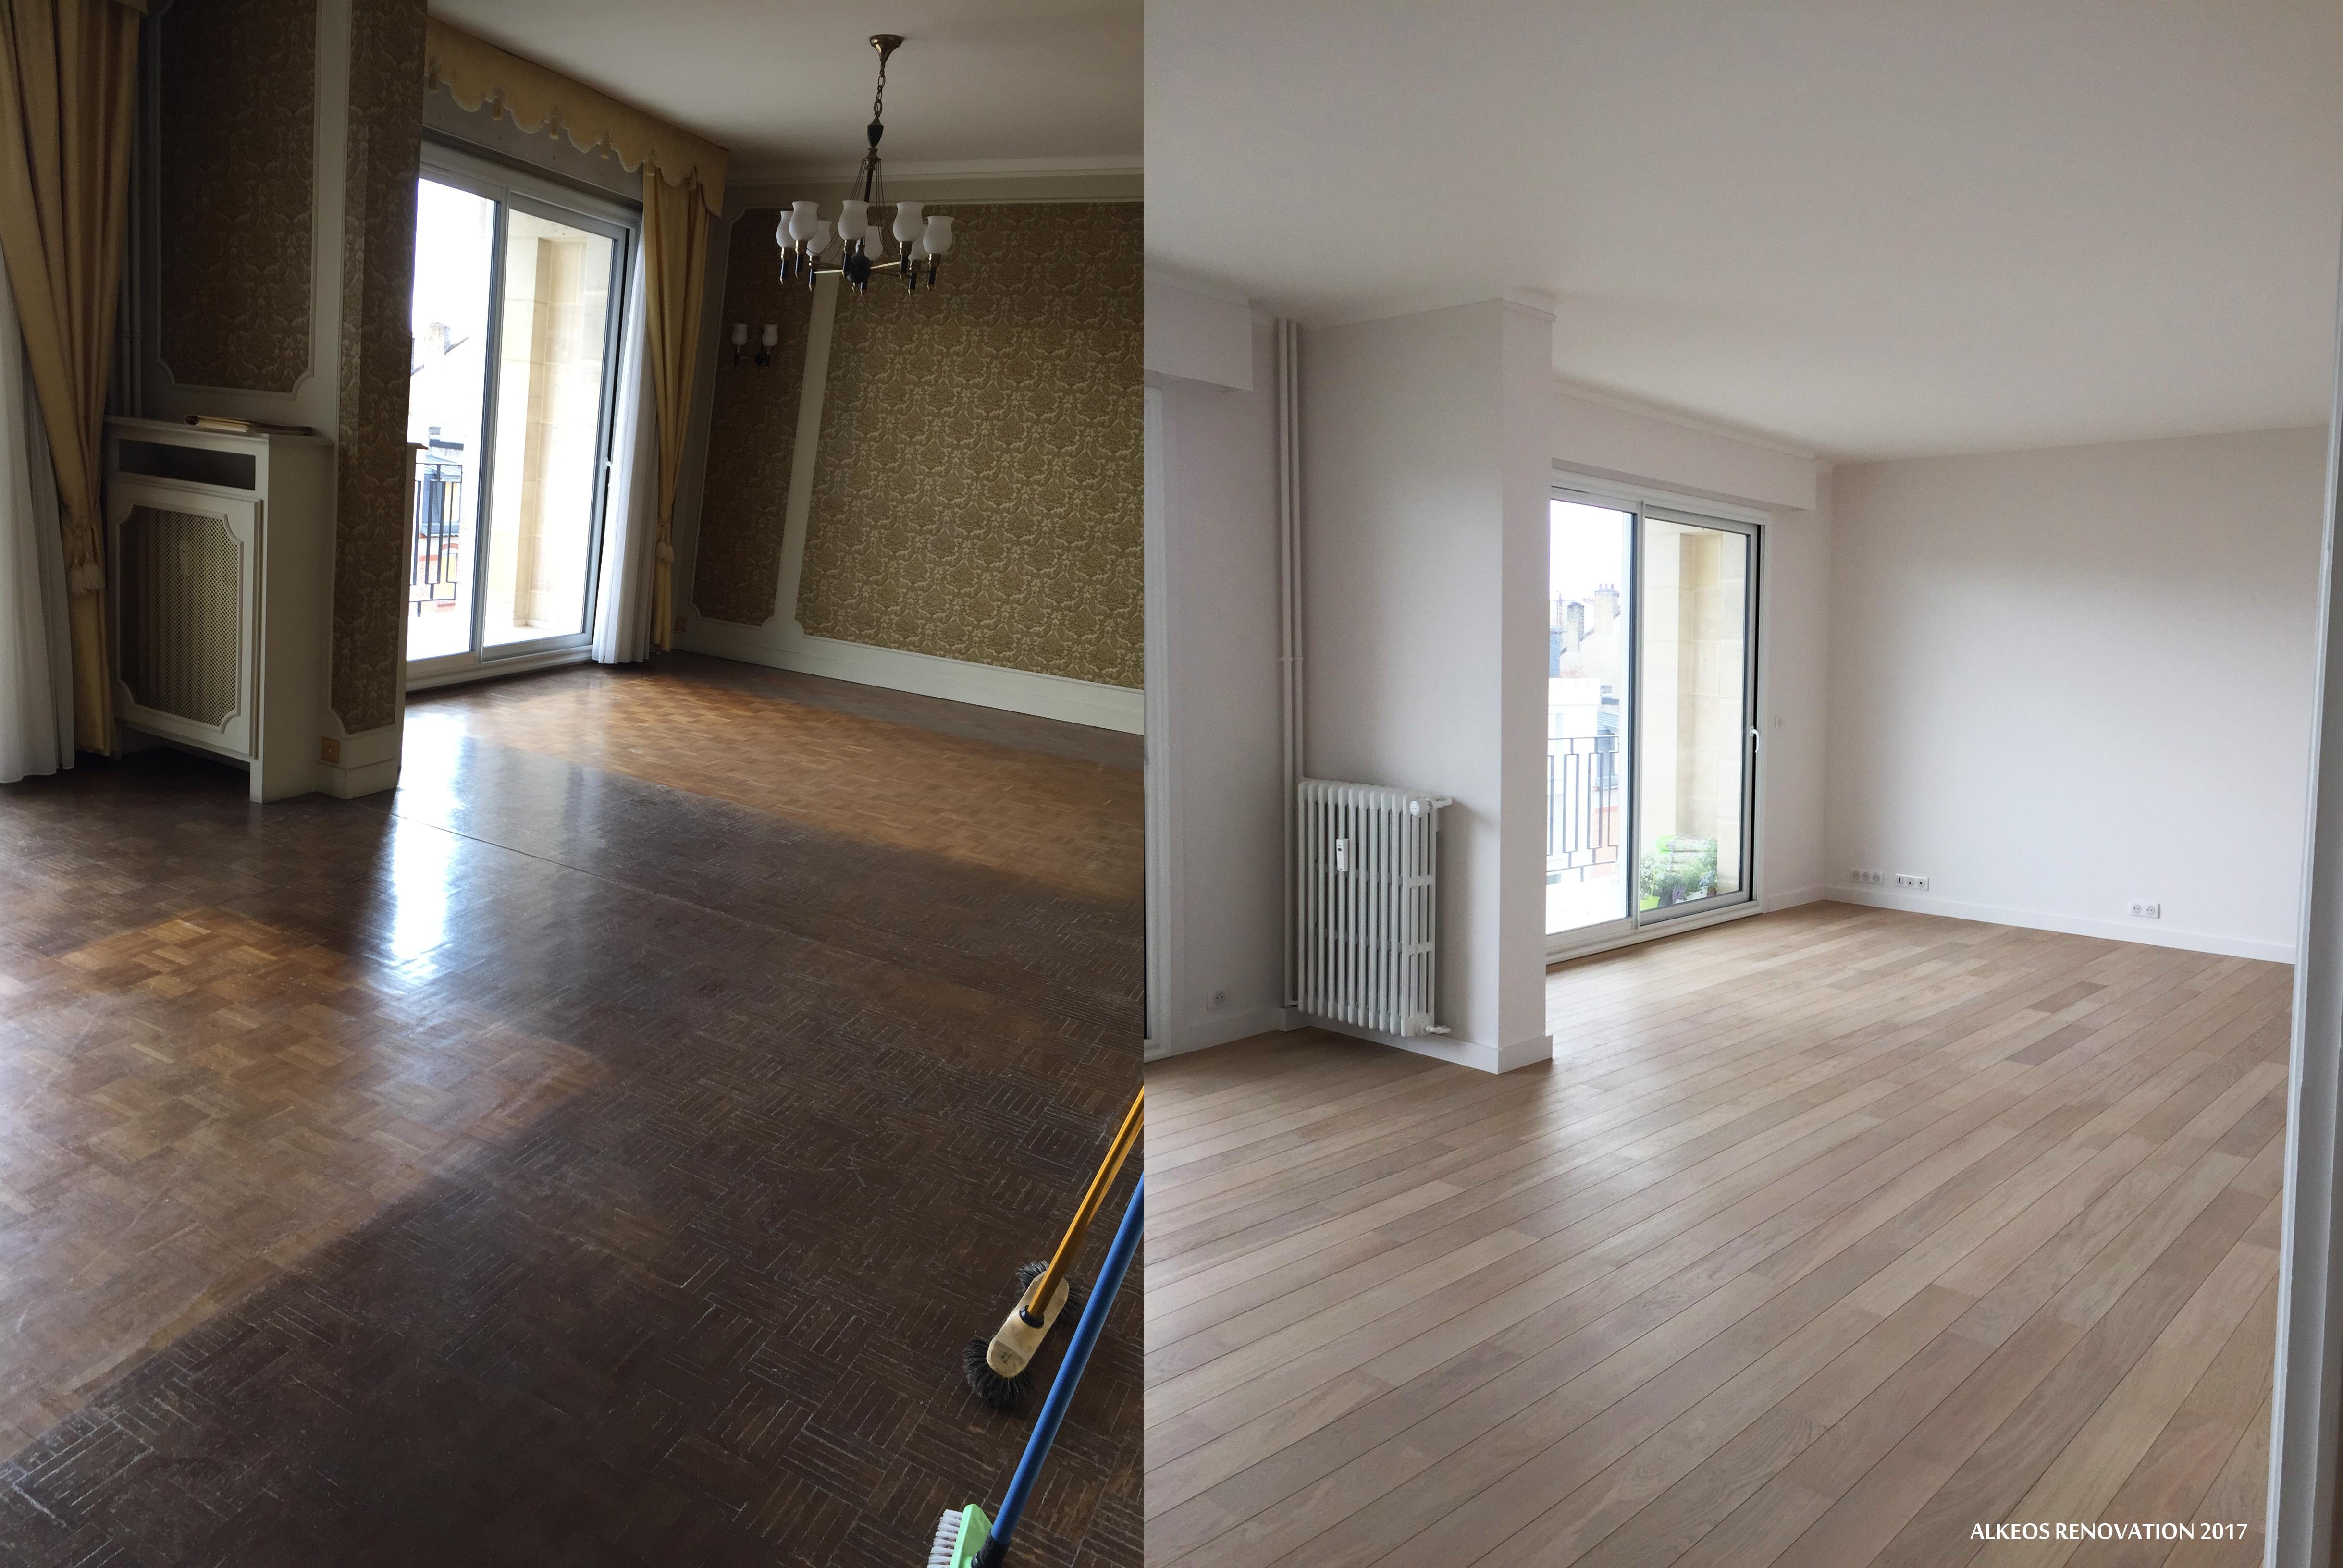 renovation appartement avant apres renovation appartement avant apres brillant rnovation salle. Black Bedroom Furniture Sets. Home Design Ideas